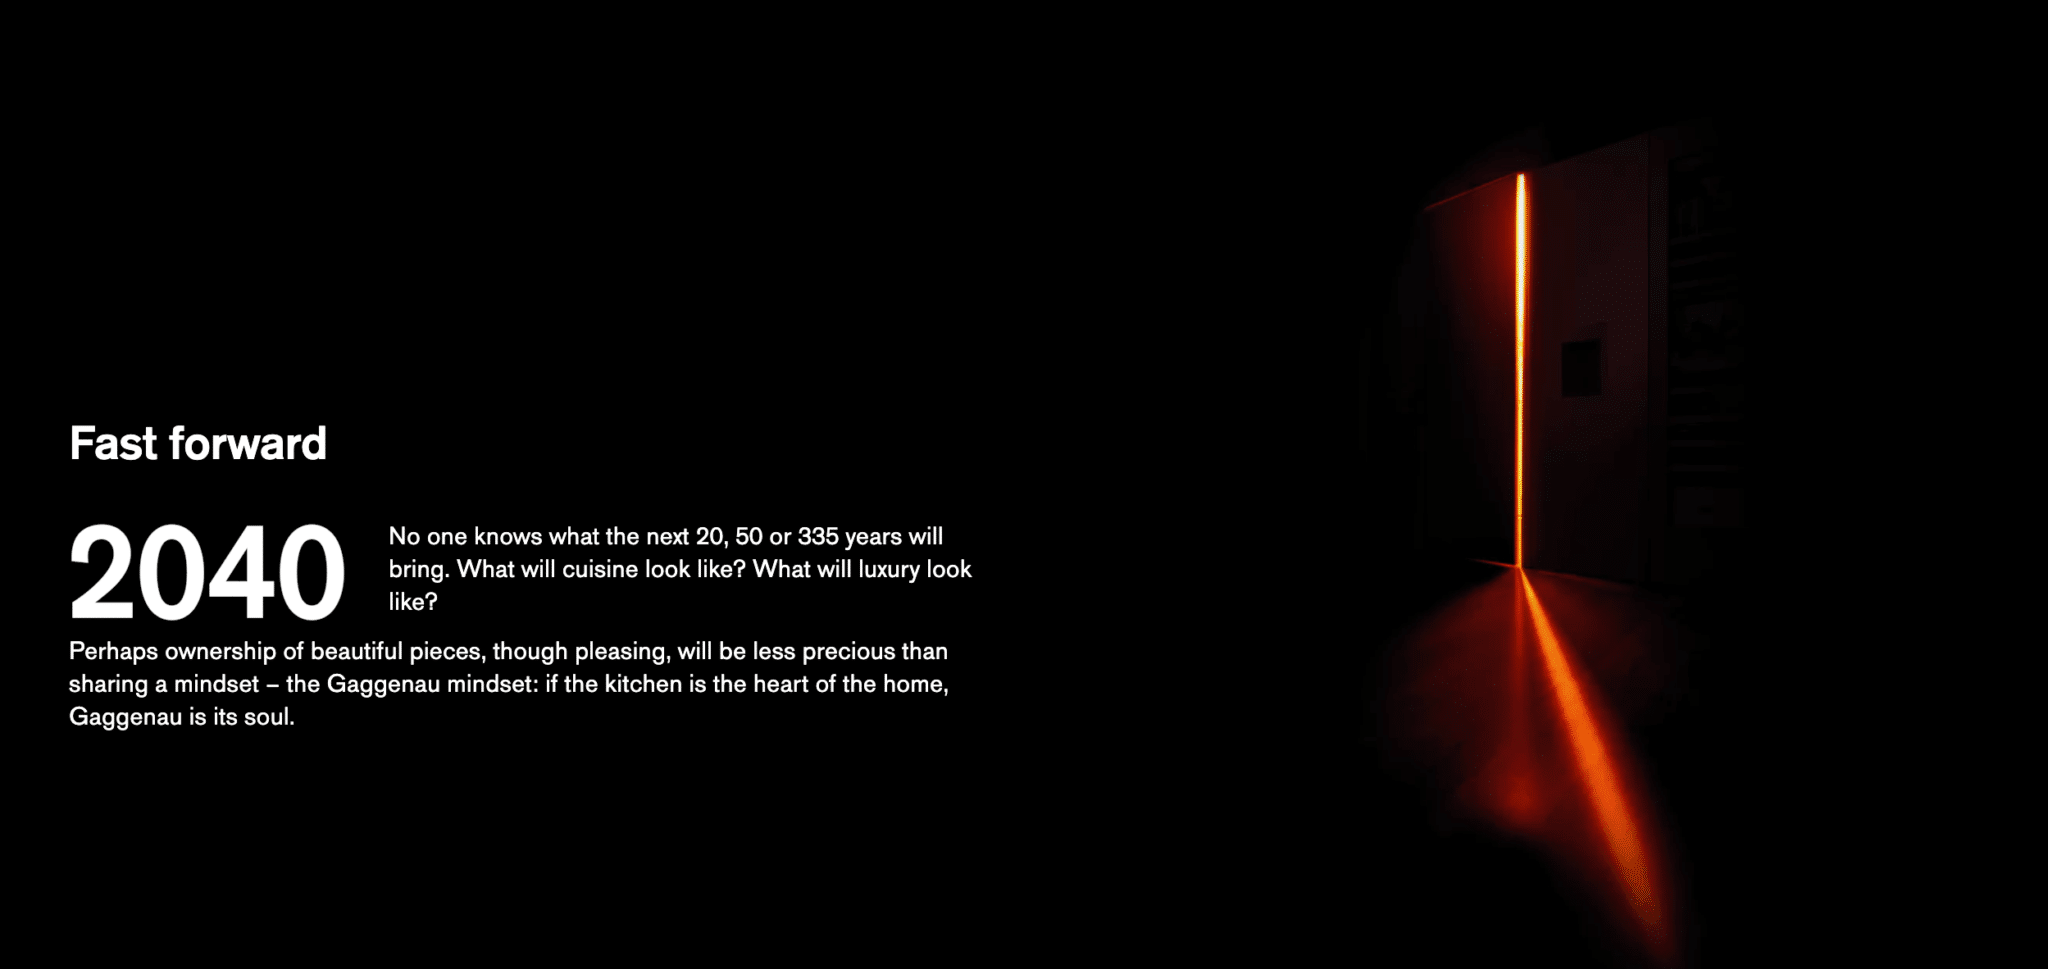 Gaggenau 2021-01-03 at 12.31.57 PM